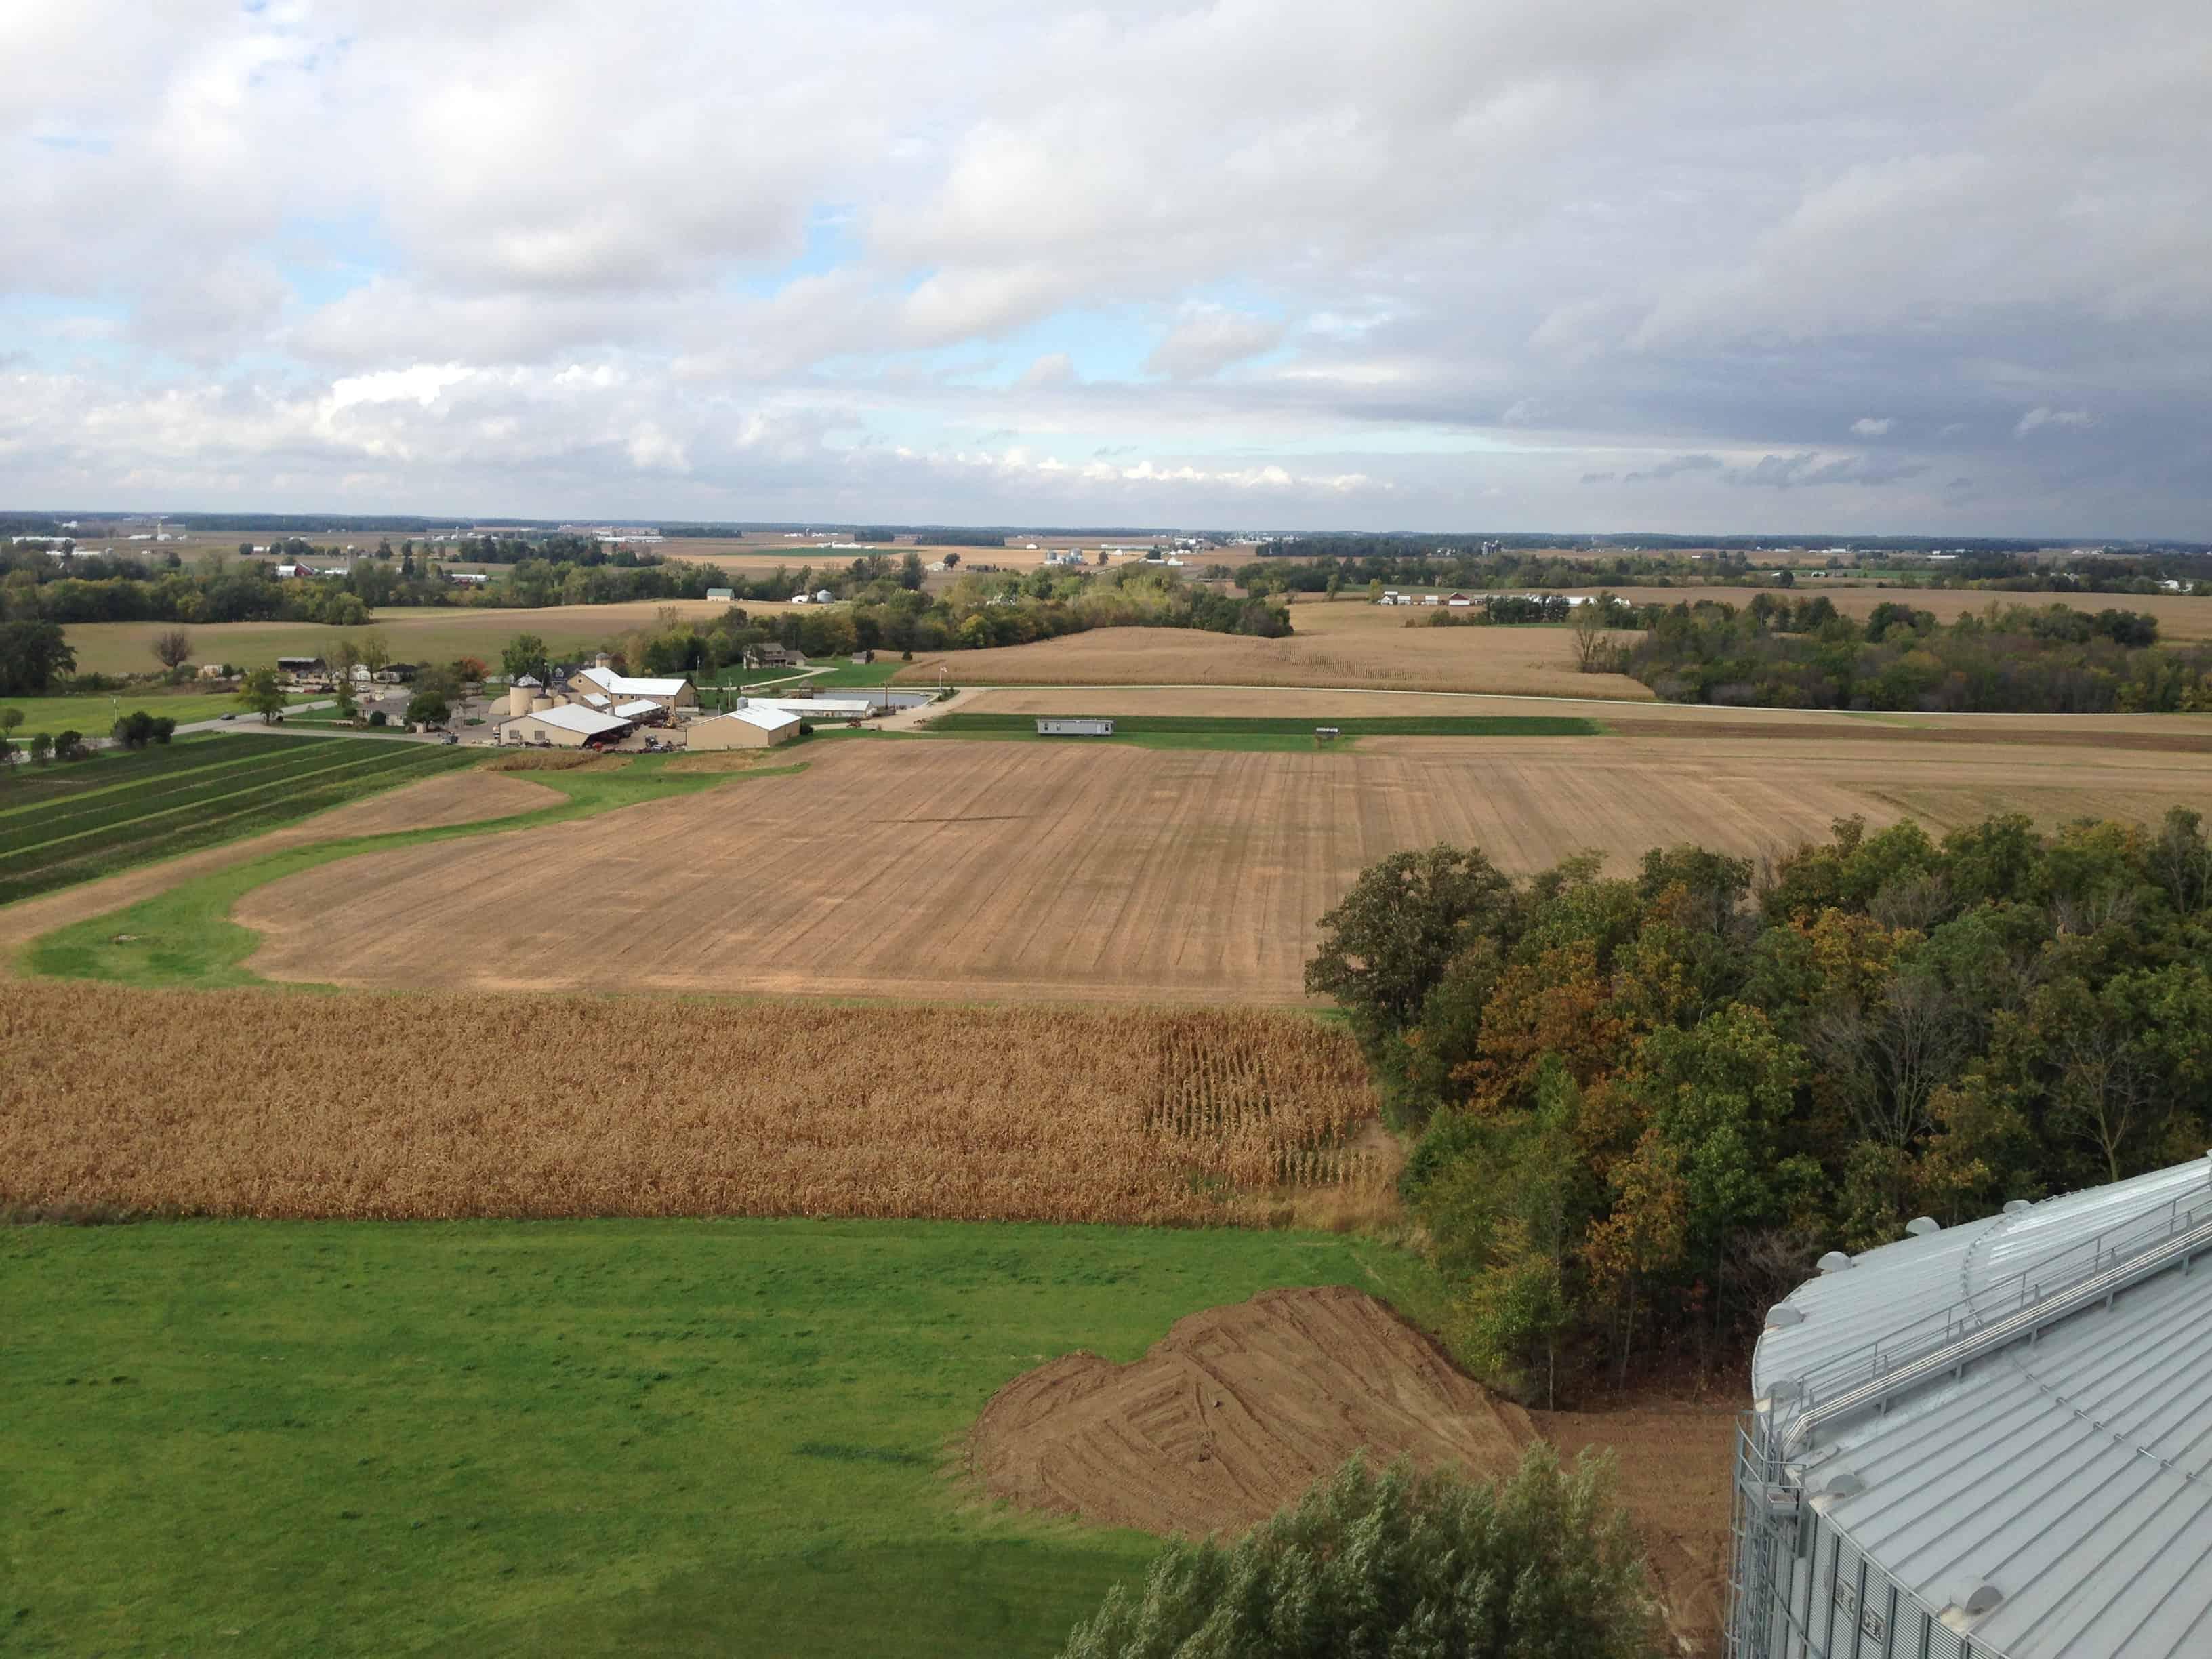 aerial view of farm land